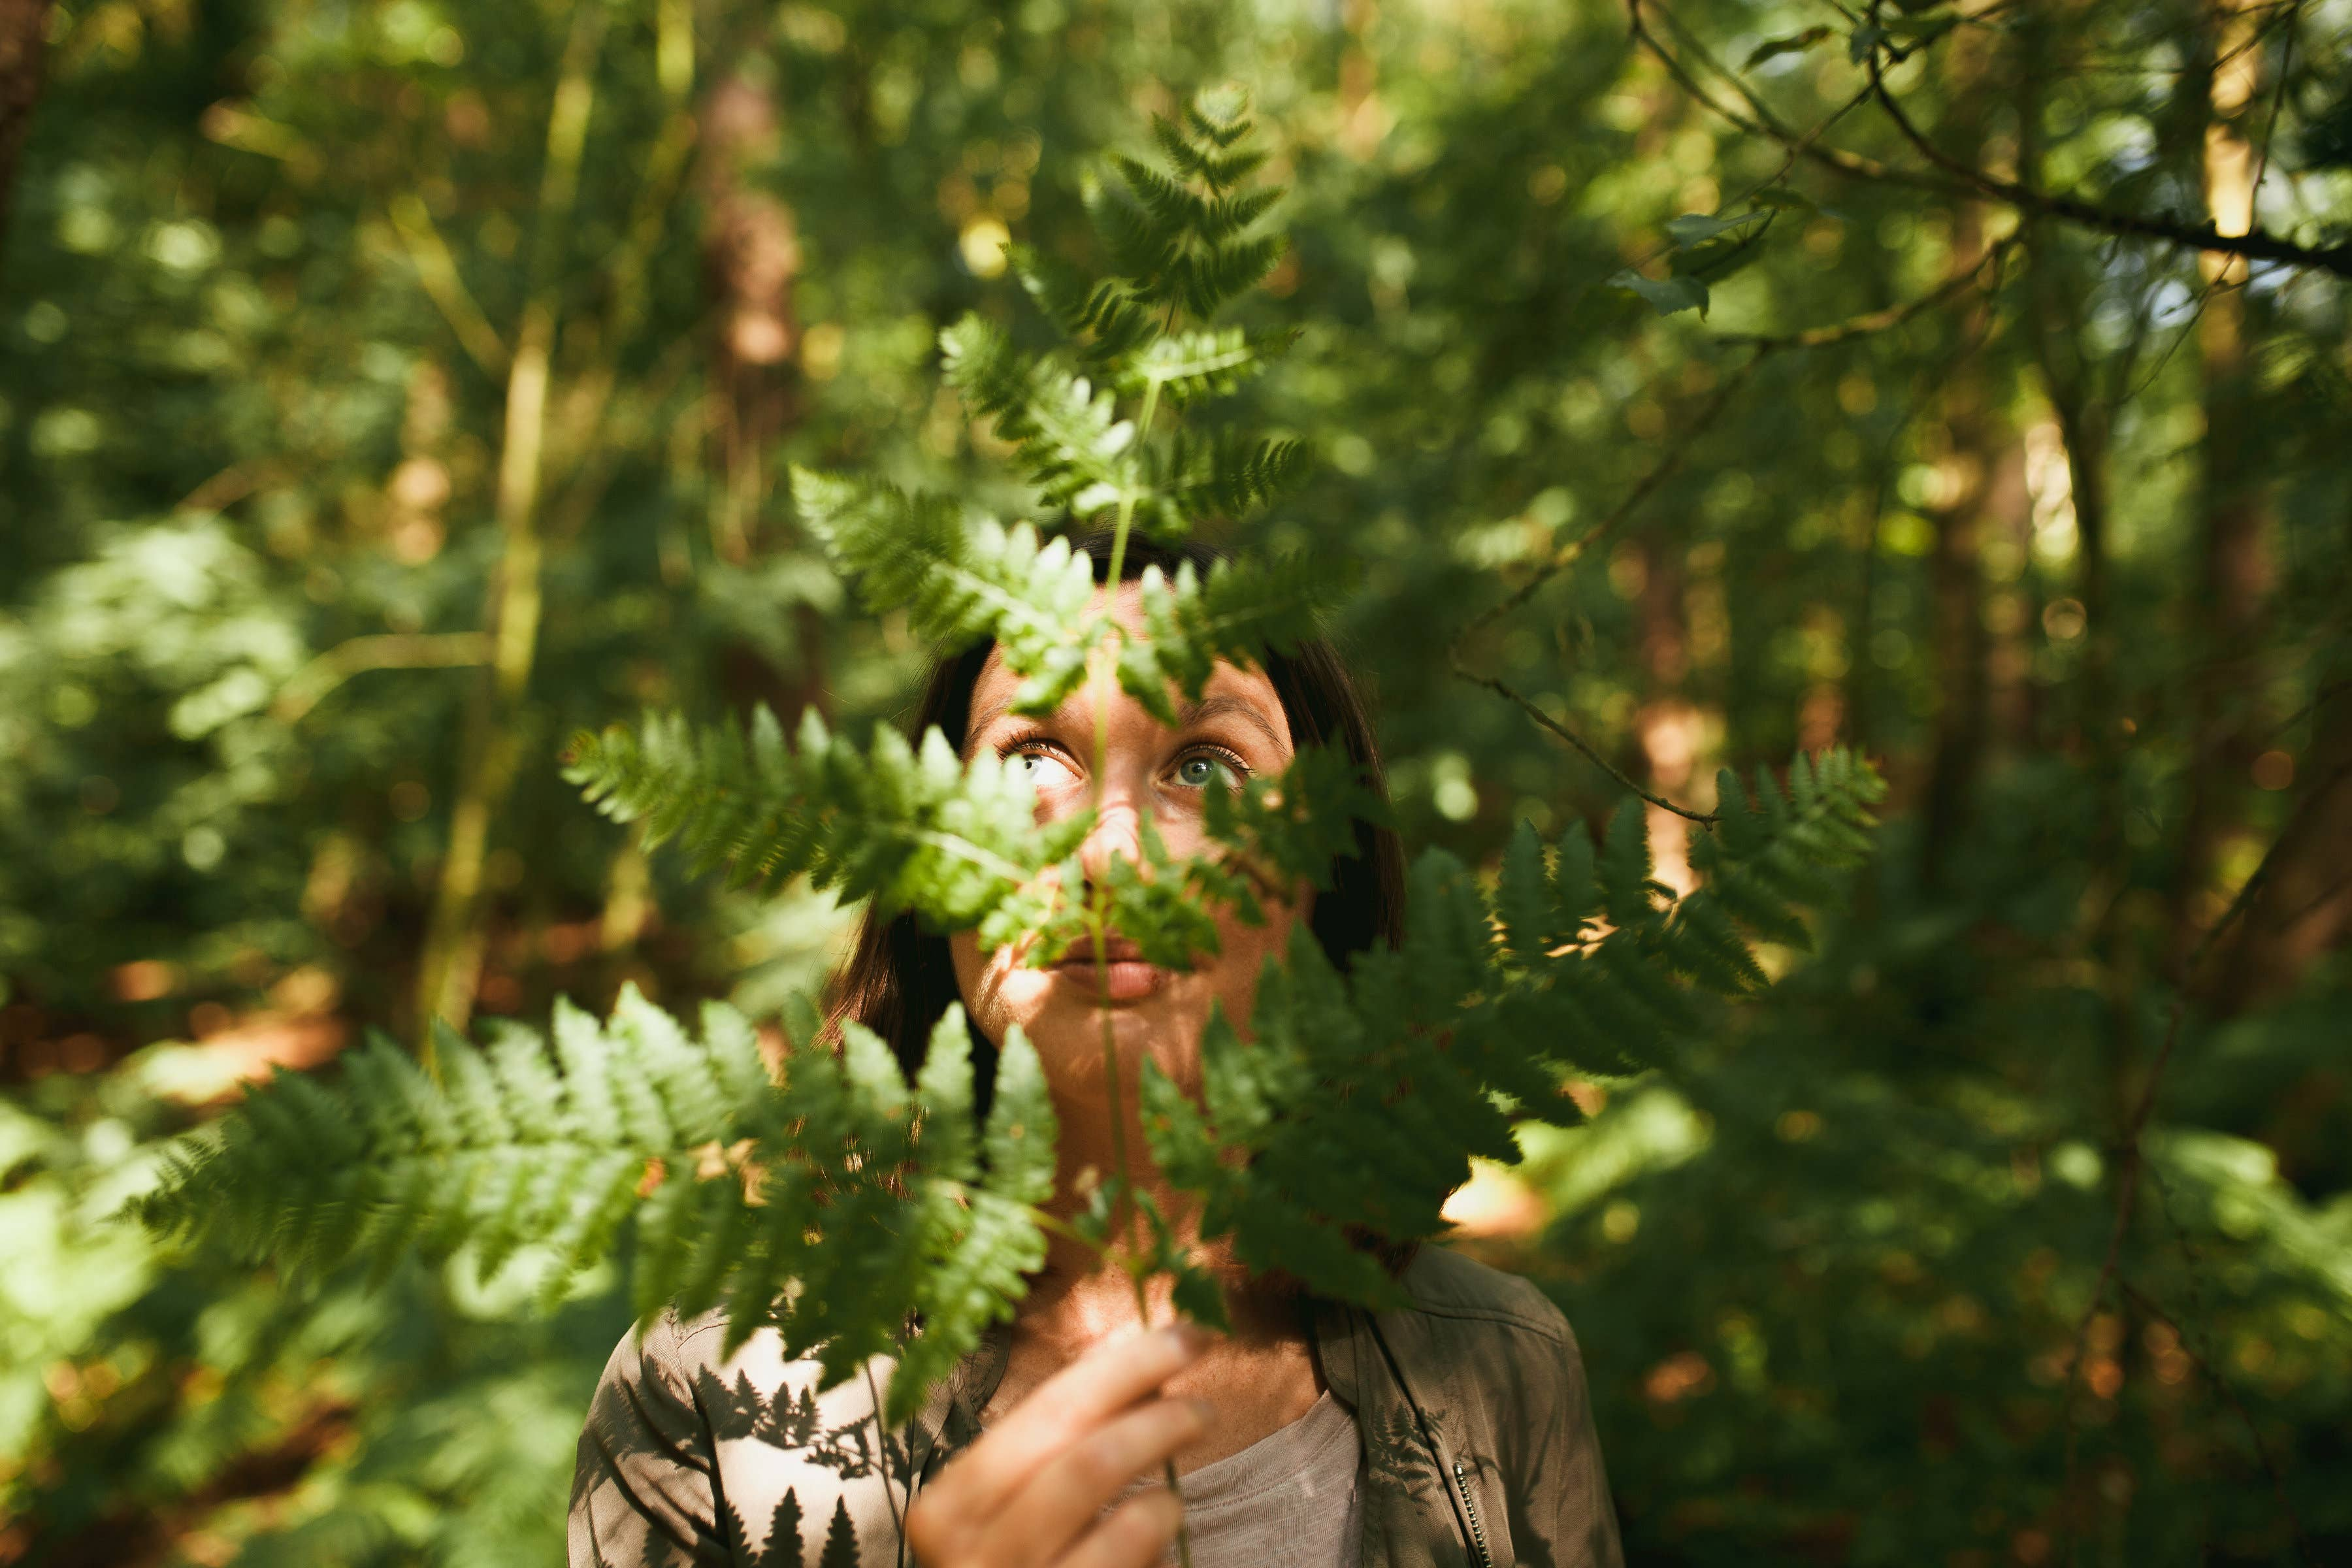 Woman holding a fern